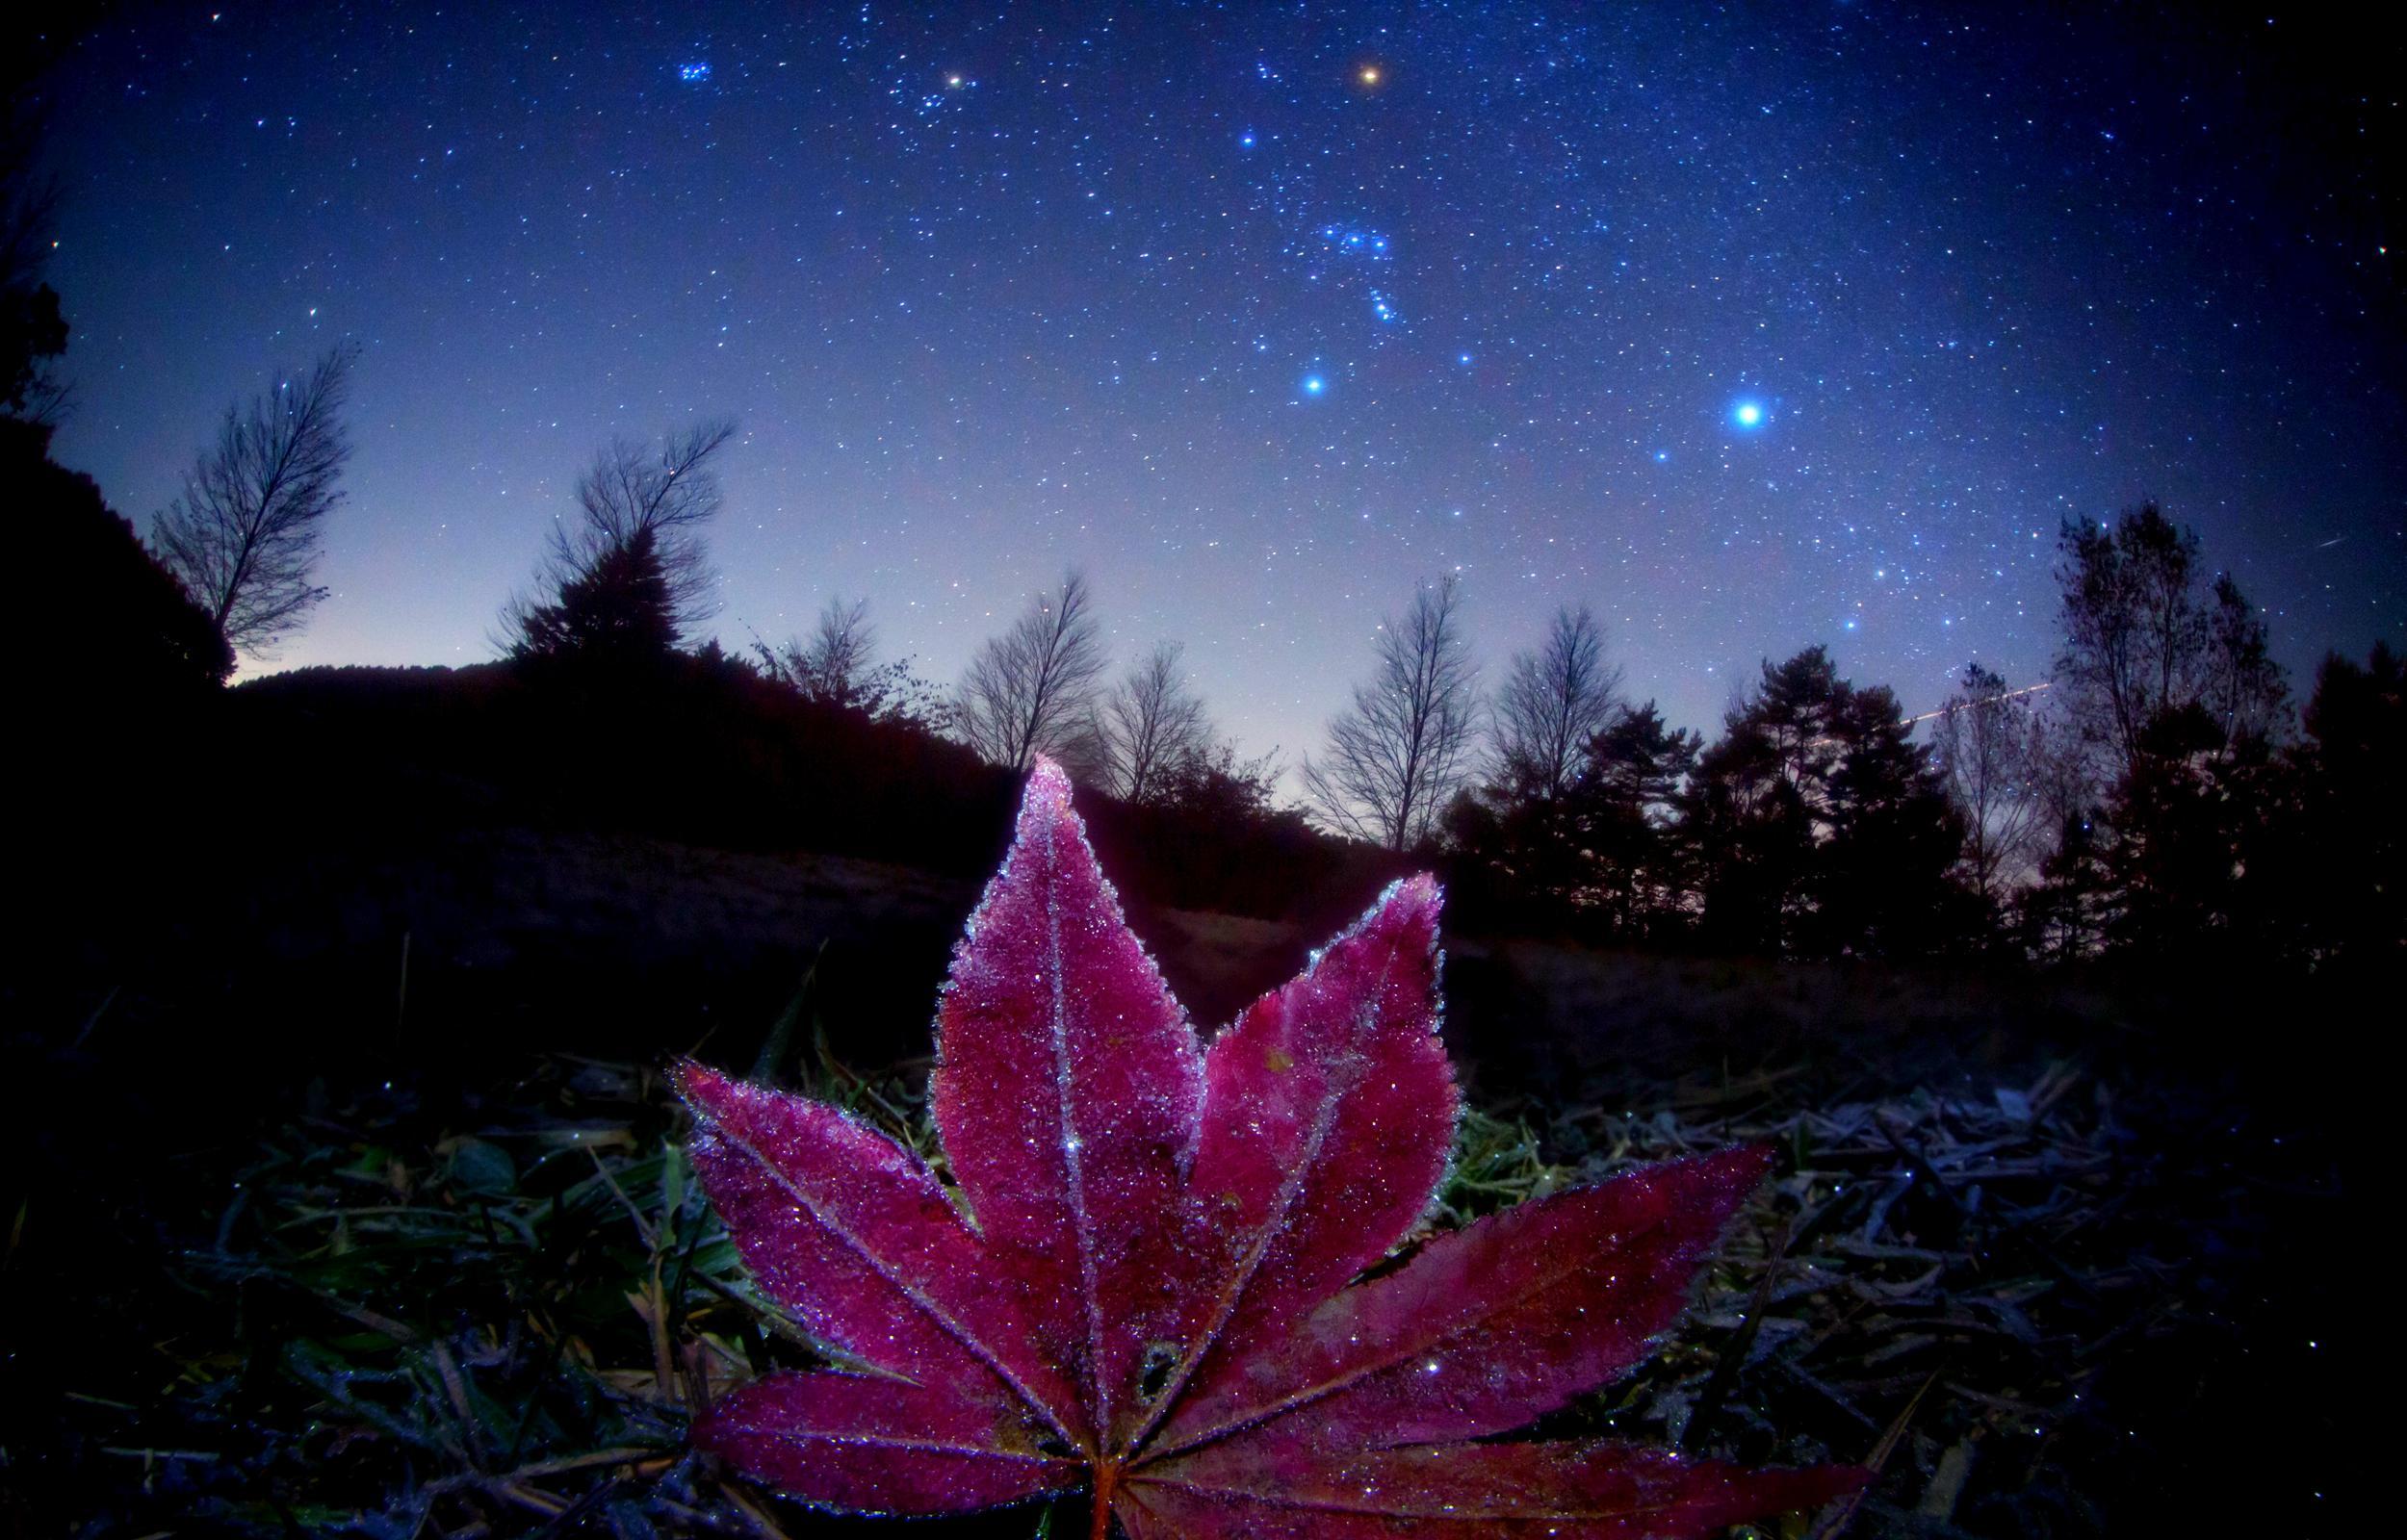 starry_sky_autumn_leaf_night_nature_hd-wallpaper-1558950